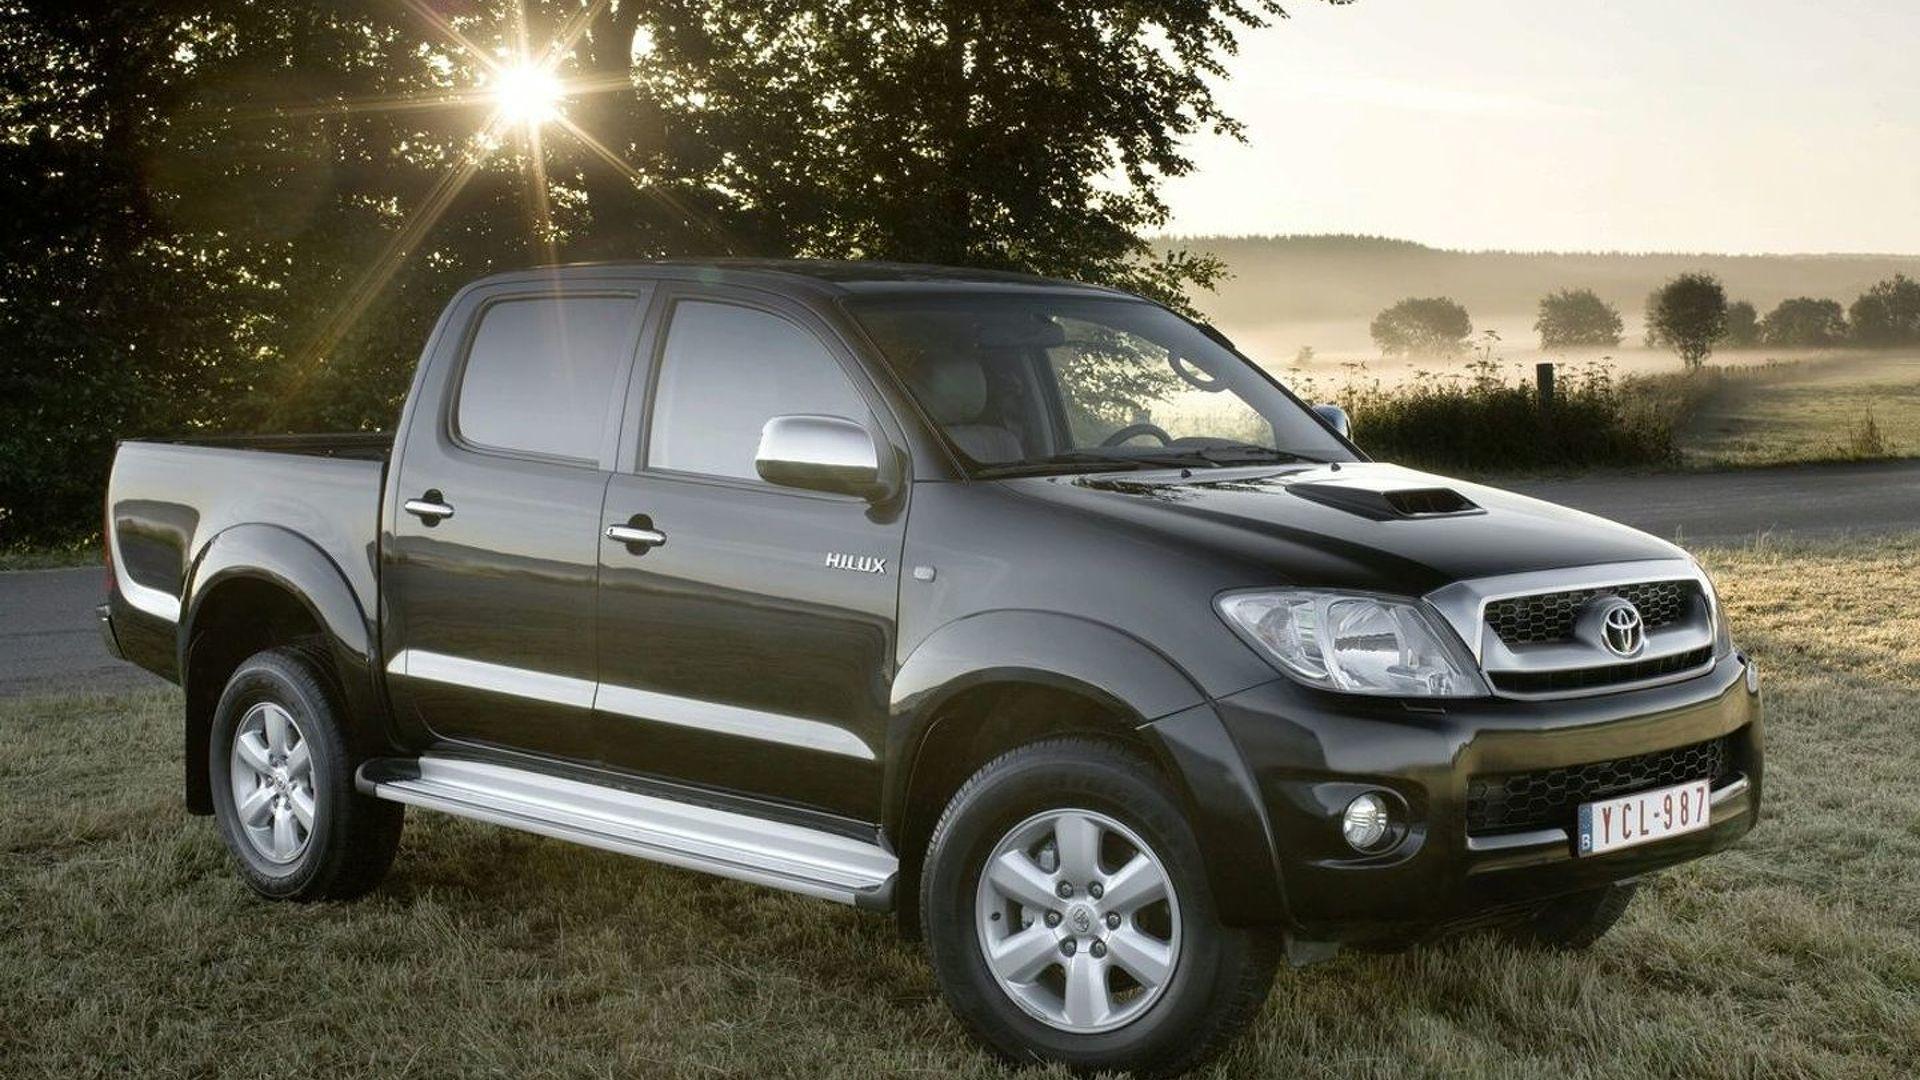 Kekurangan Toyota Hilux 2009 Spesifikasi